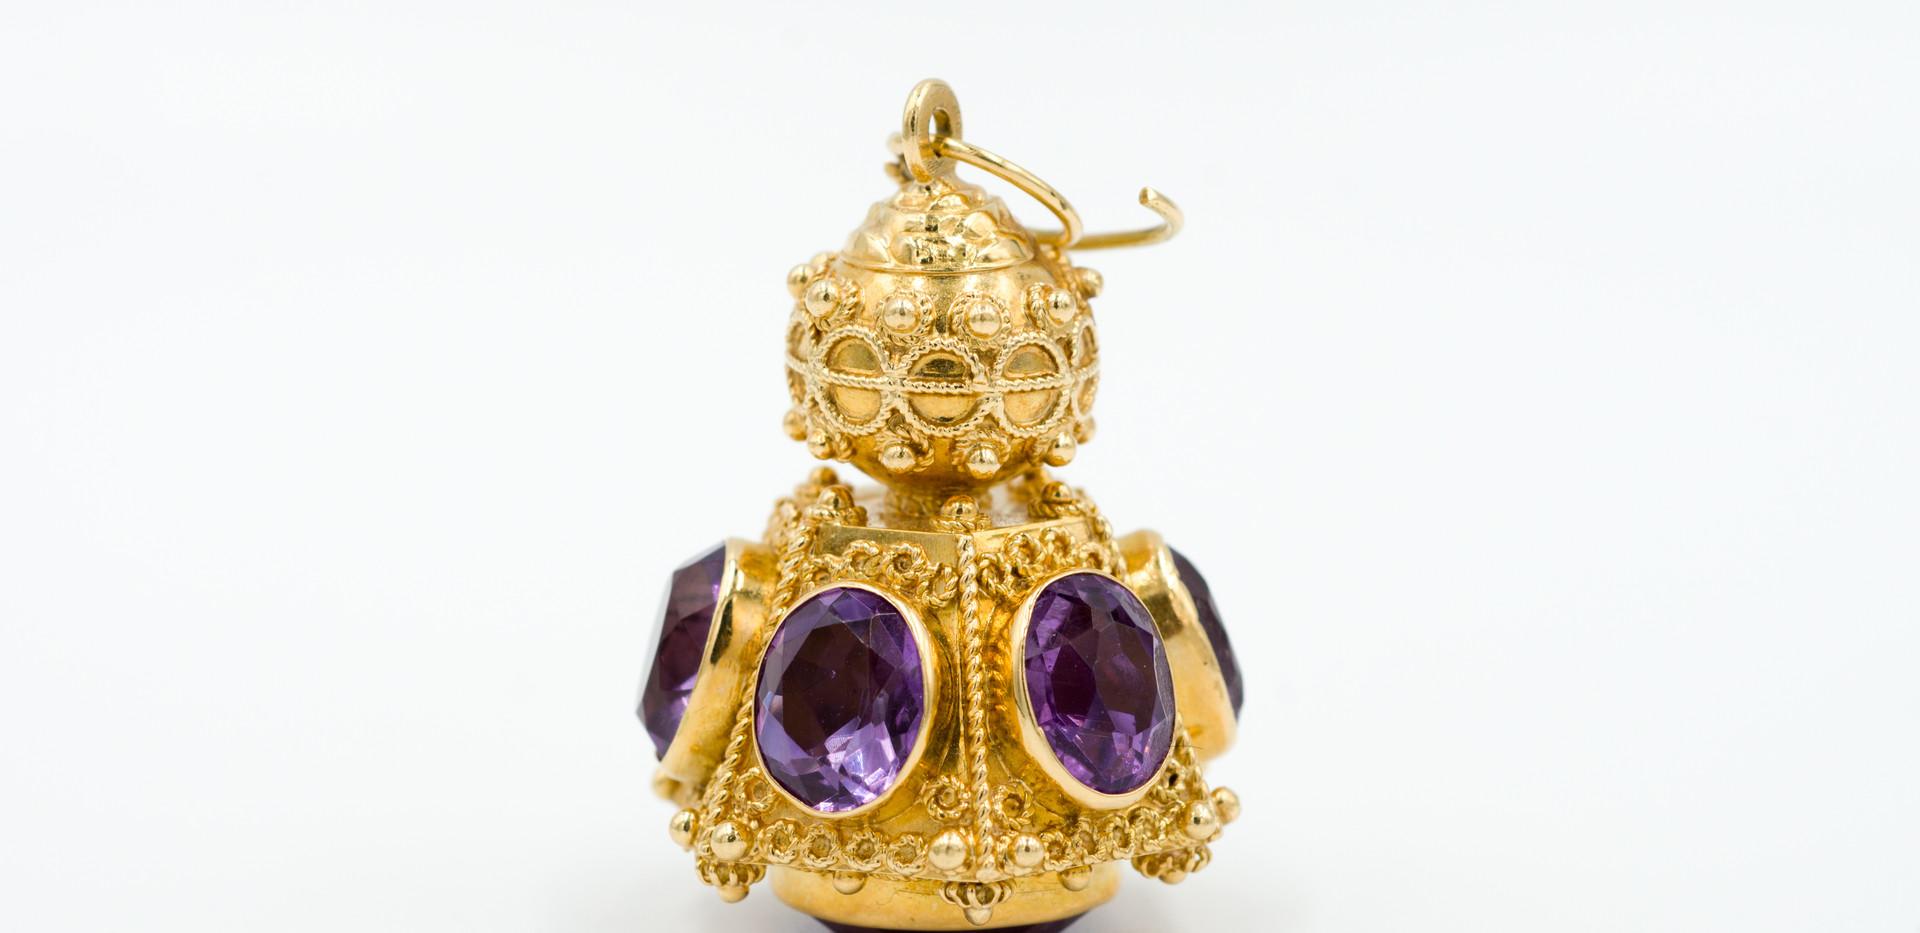 Italian 18k Gold and Amethyst Pendant